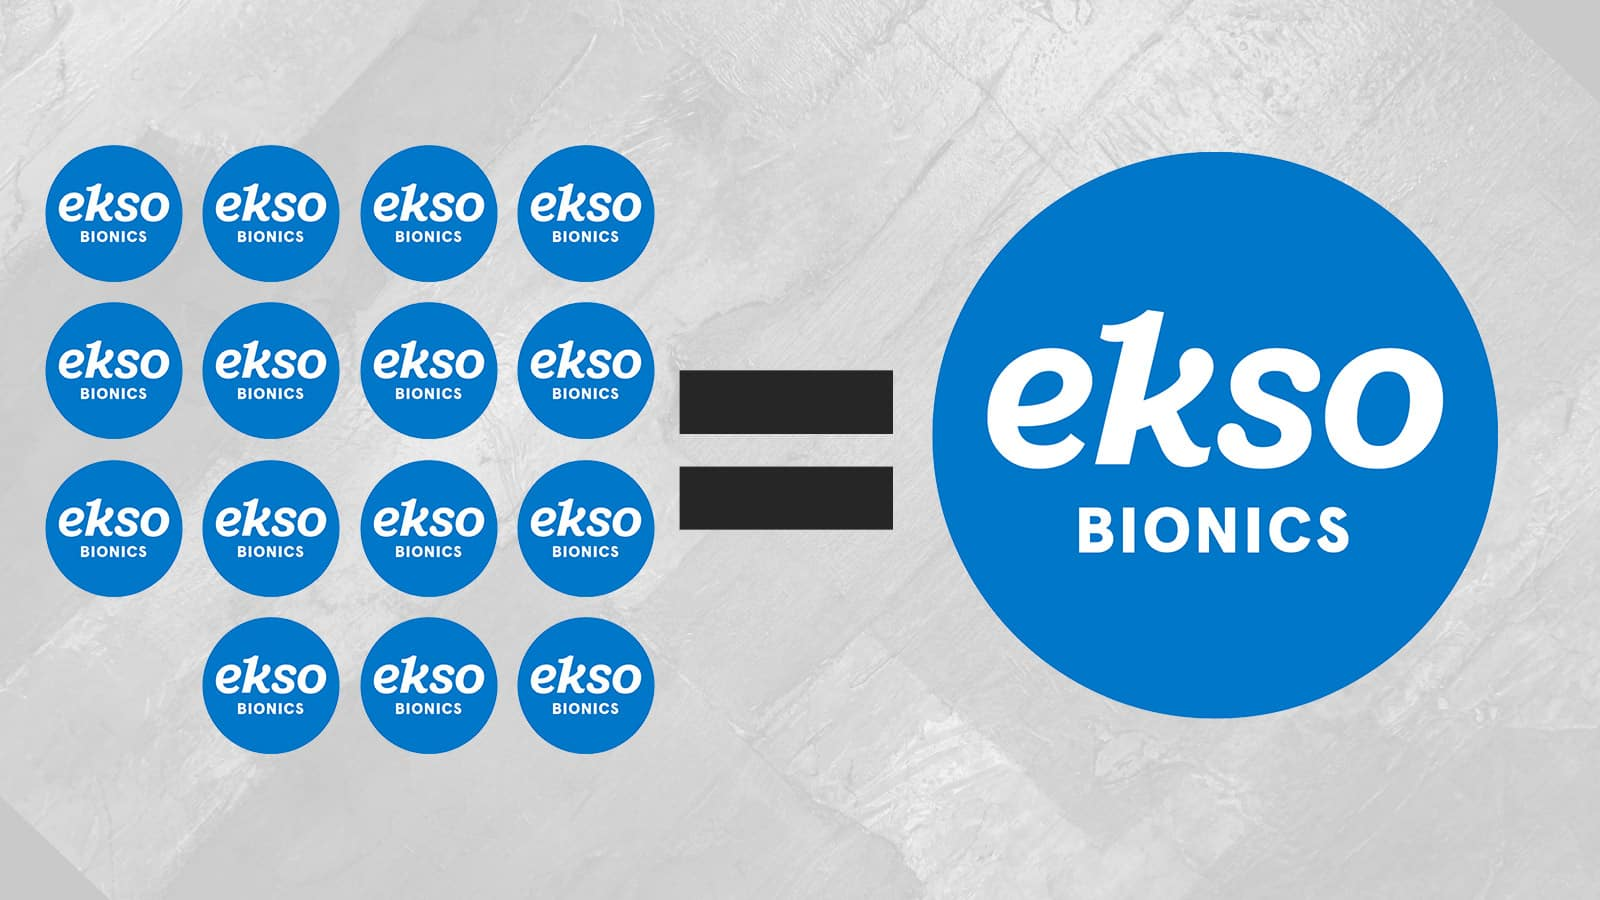 Ekso Bionics Executes a 1 to 15 Reverse Stock Split